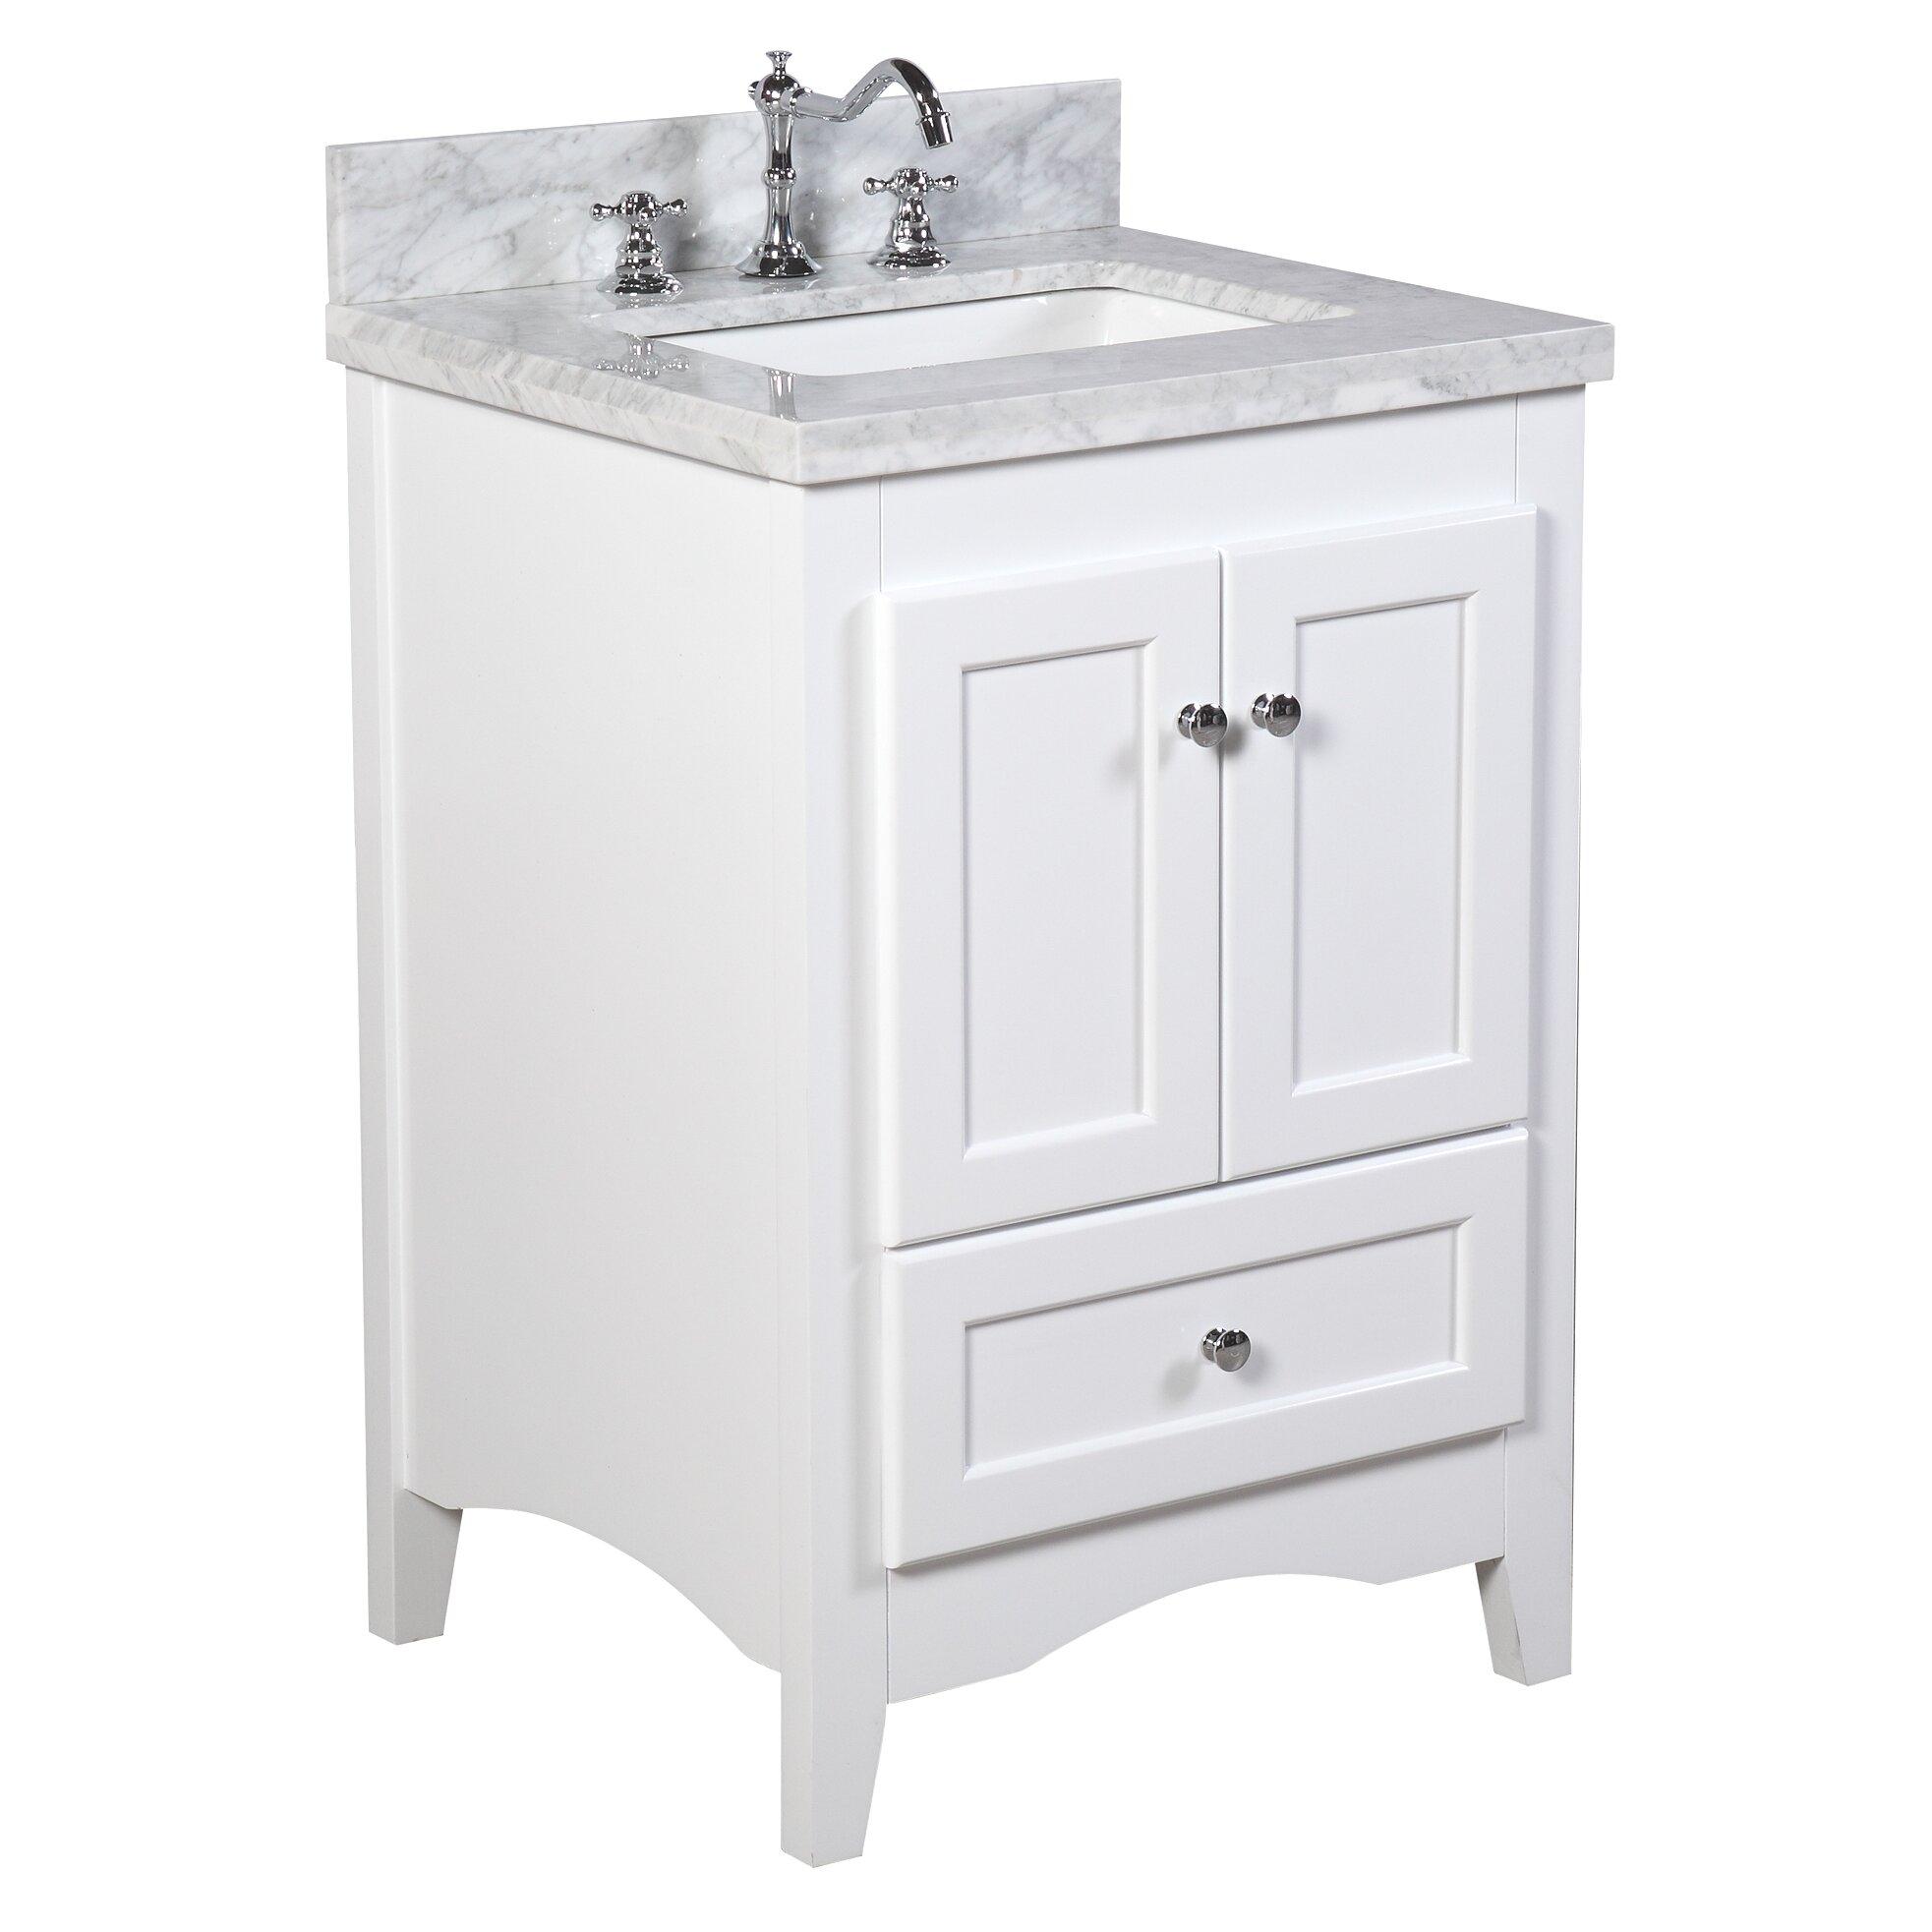 "KBC Abbey 24"" Single Bathroom Vanity Set & Reviews"